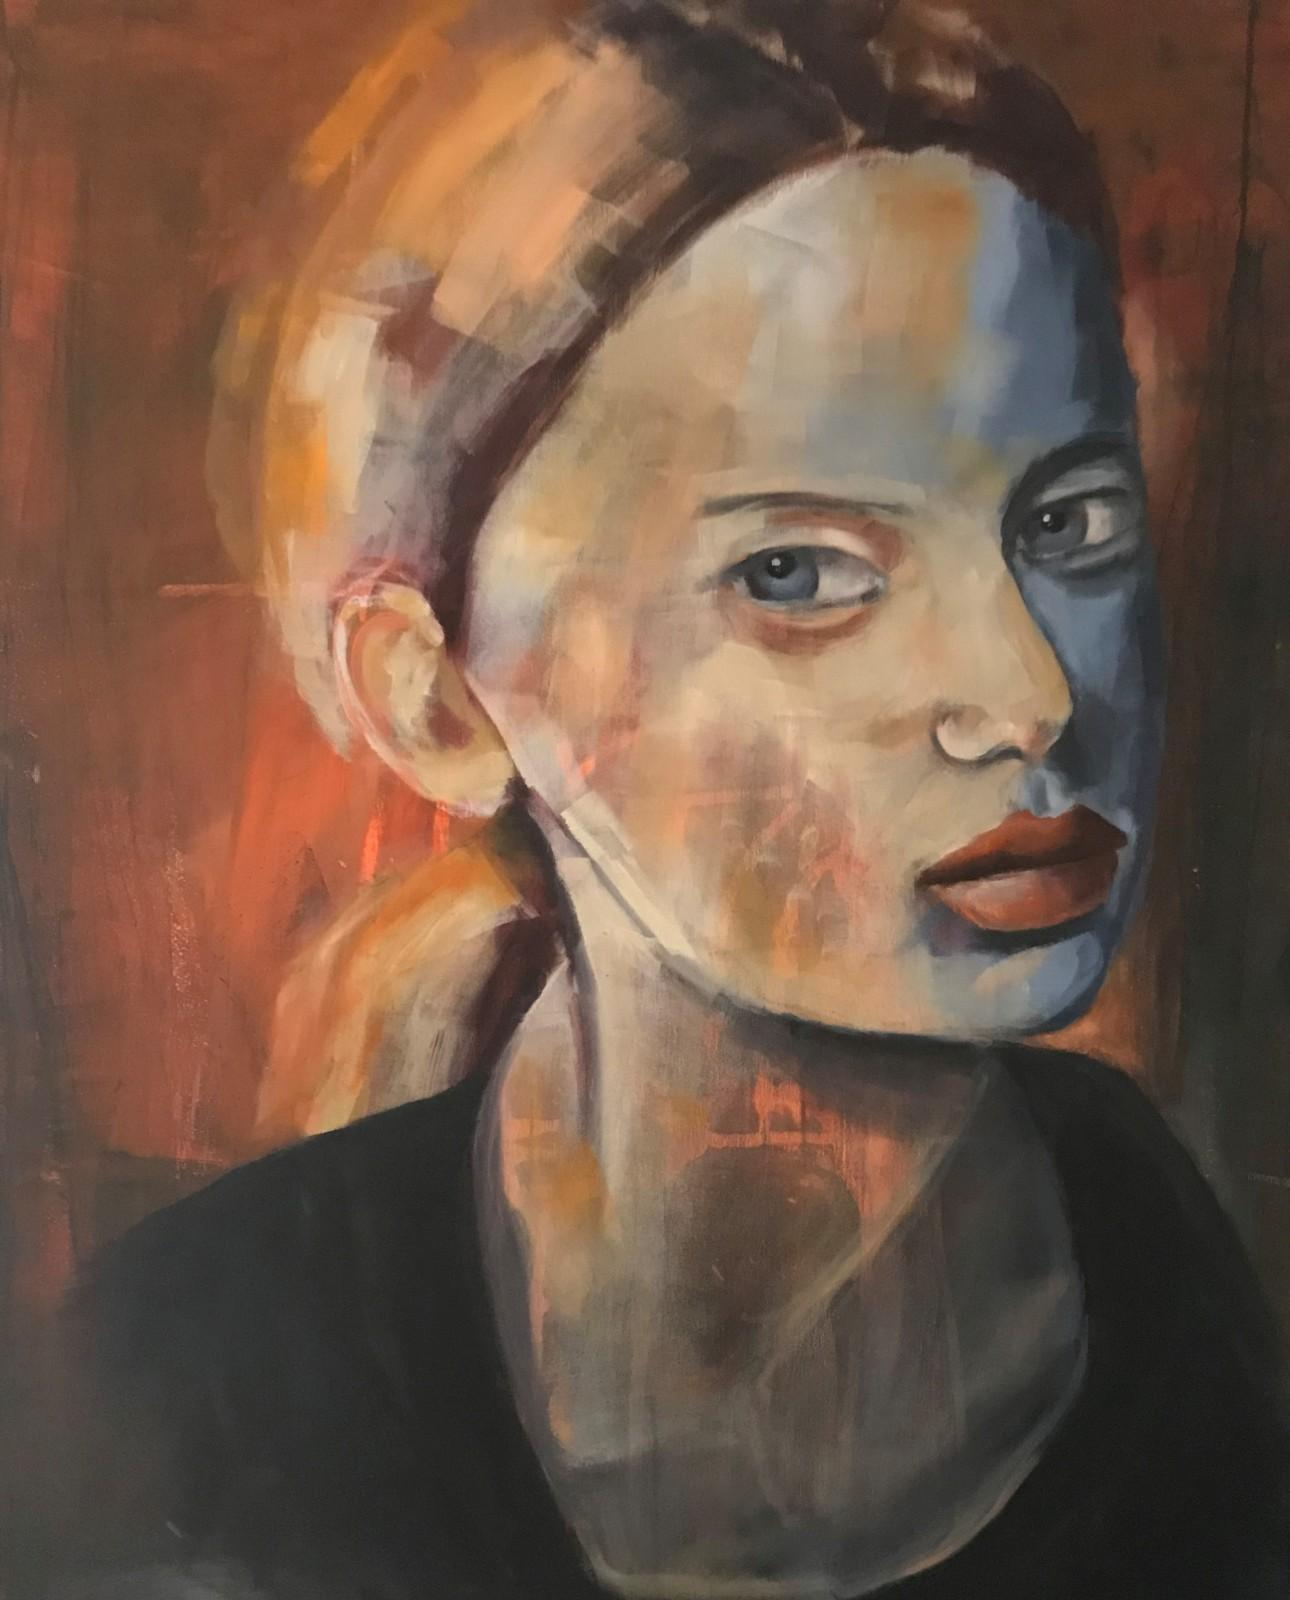 Porträt 'Agnis', Öl auf Leinwand, 100 cm h x 80 cm b x 3 cm t